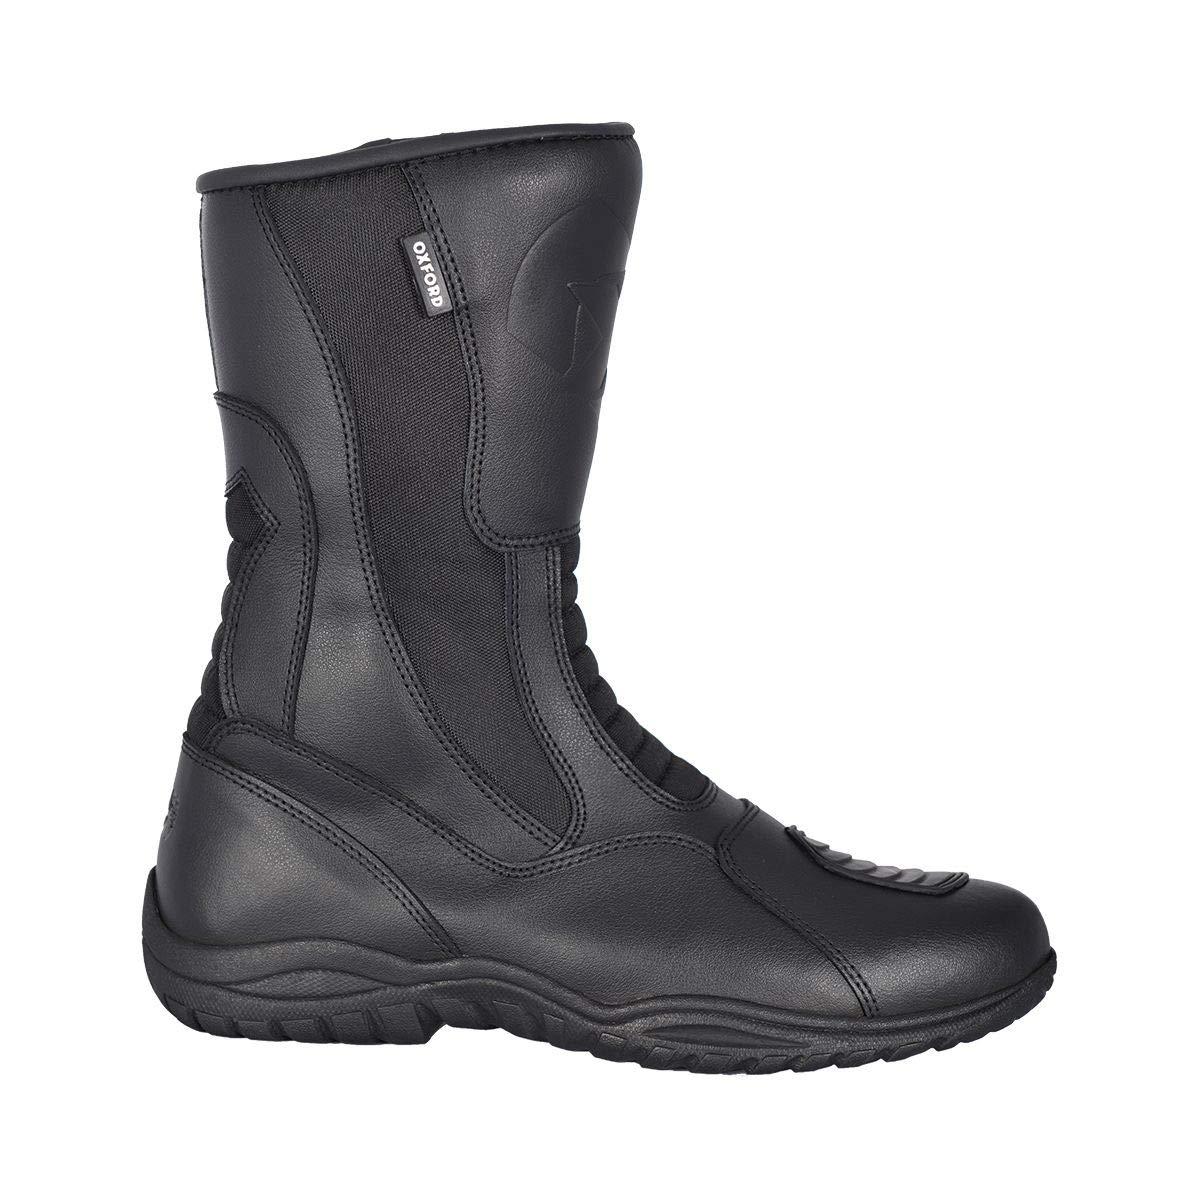 Oxford Tracker Waterproof Leather Motorbike Motorcycle Boots Black